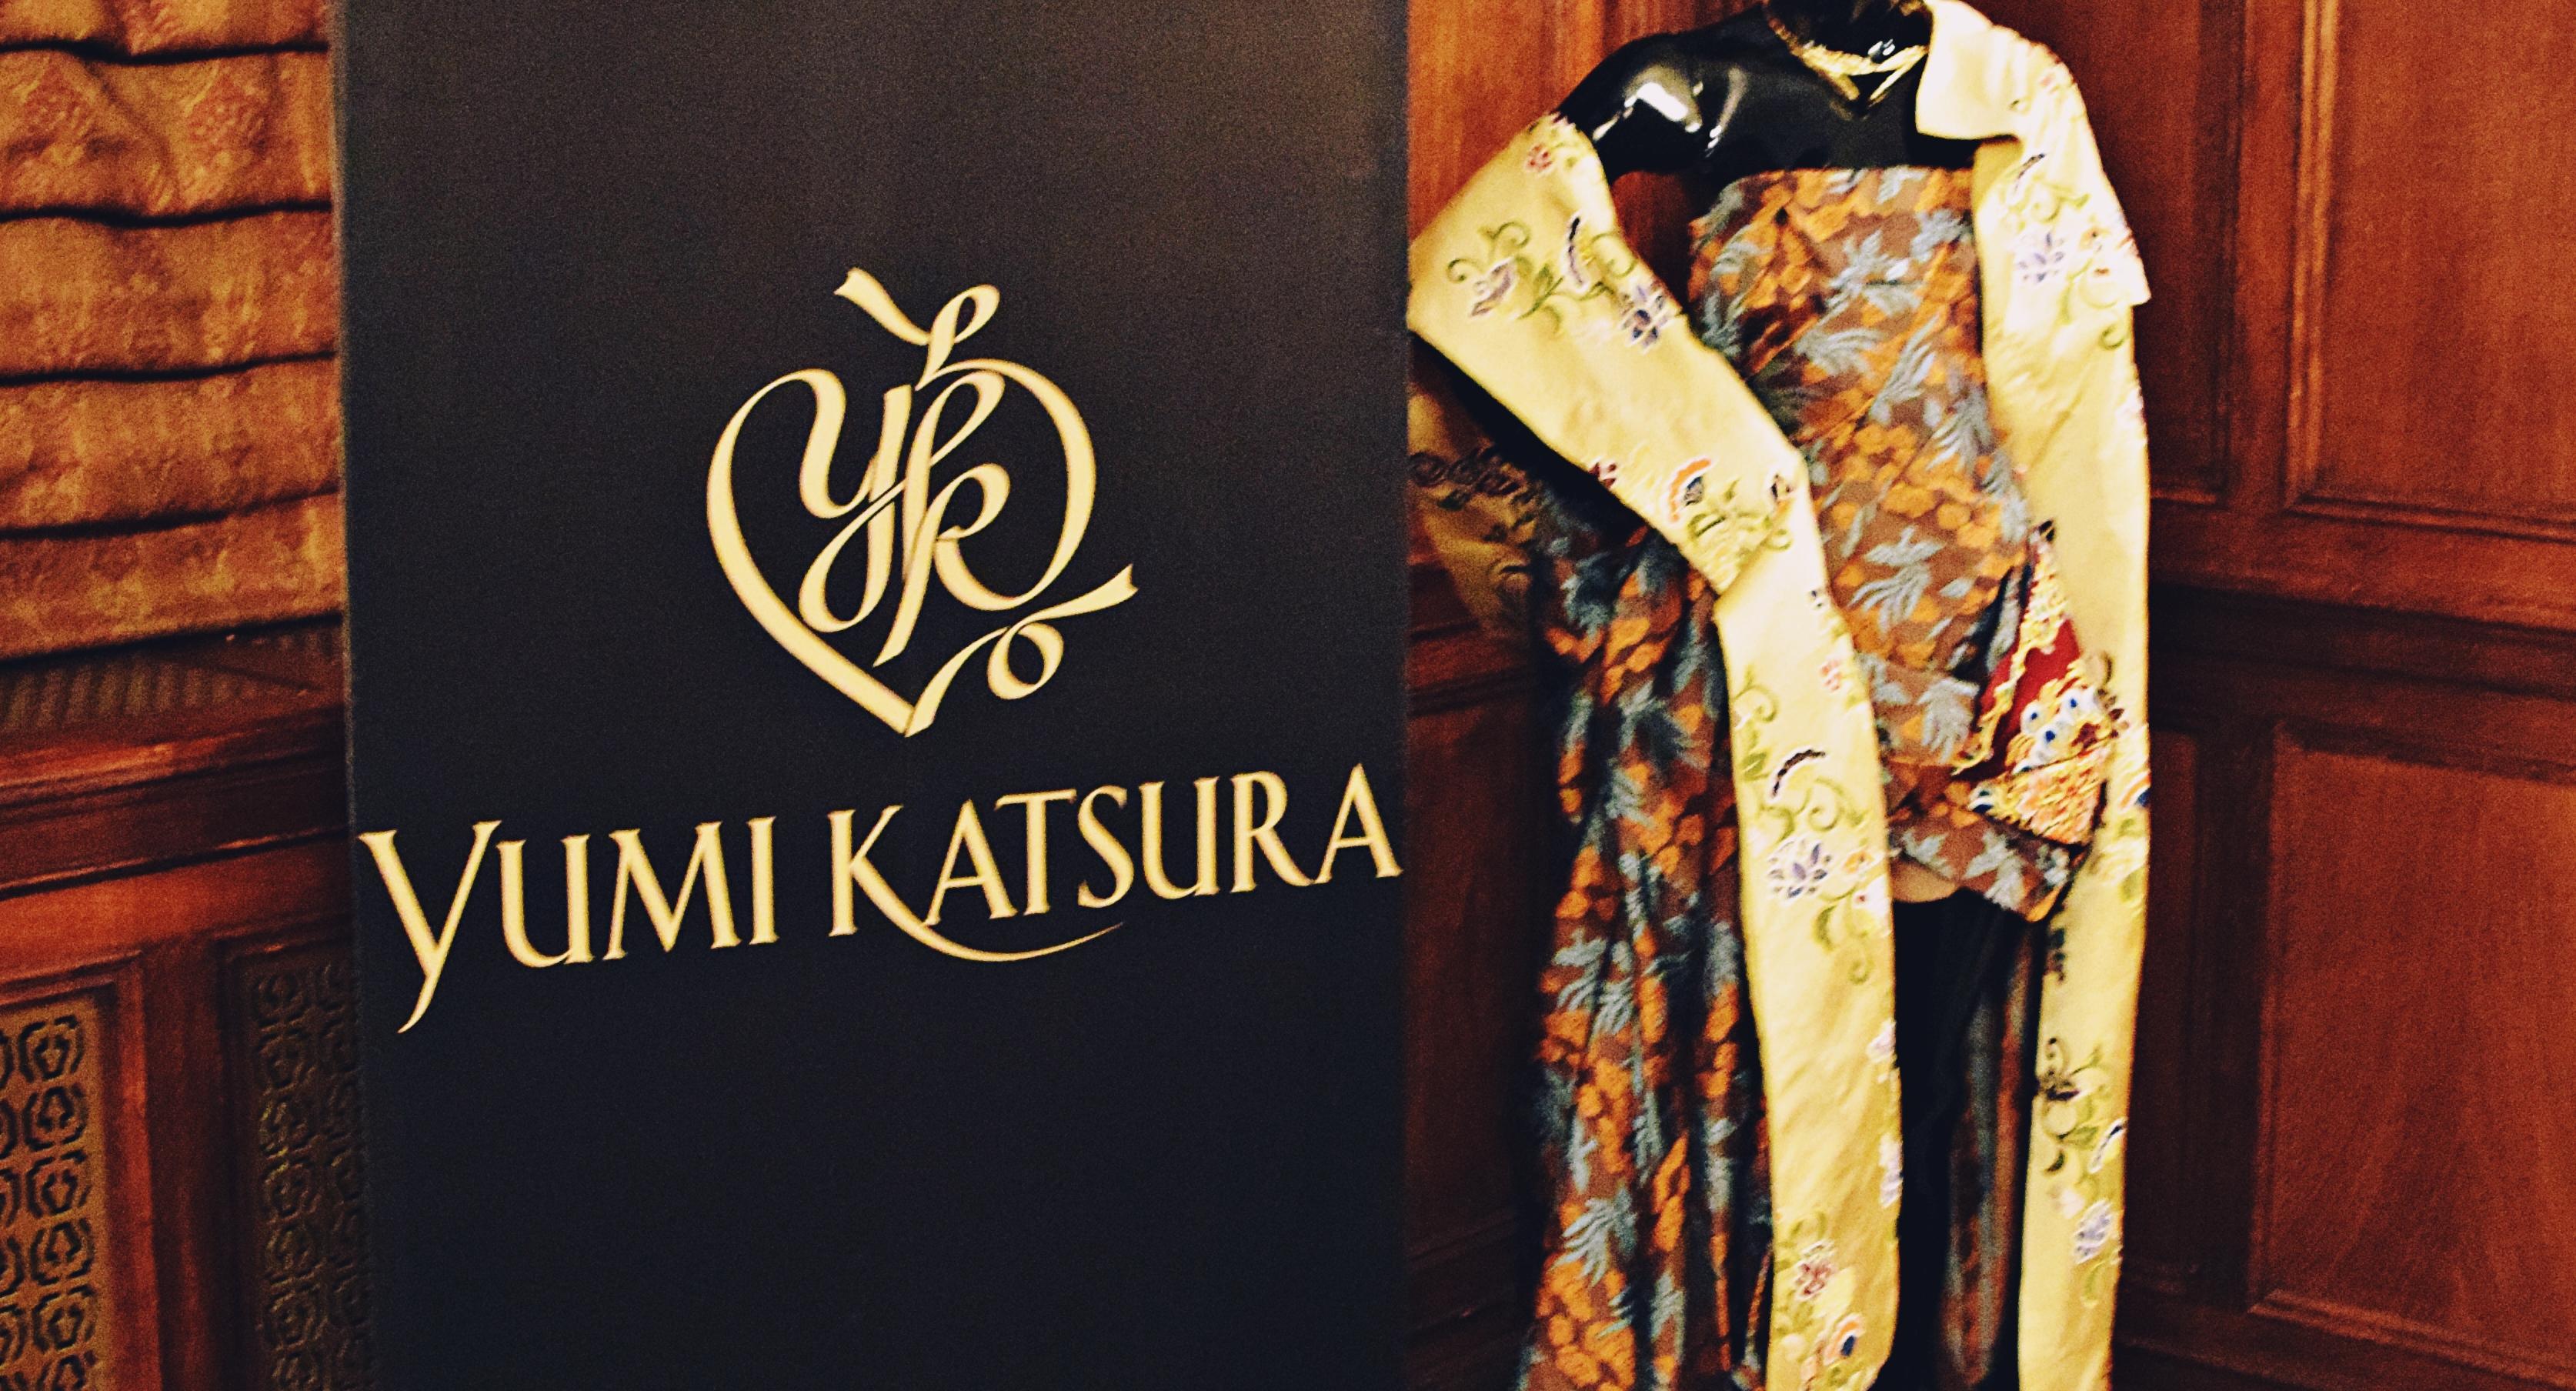 NYFW Recap: Art of Couture, Yumi Katsura